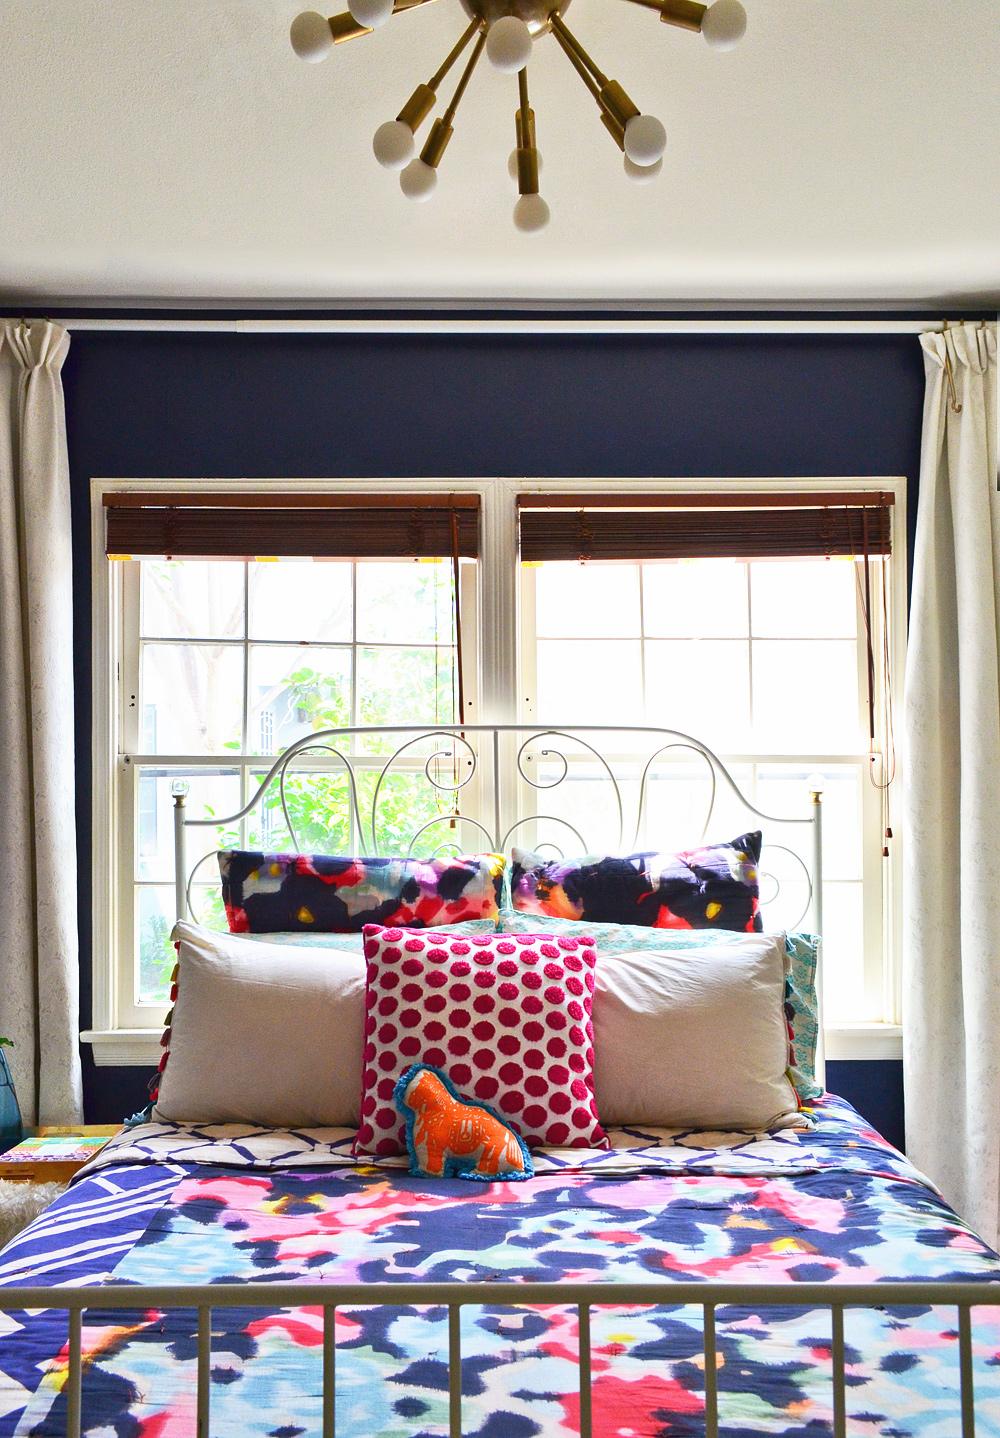 Anthropologie-Watercolor-Quilt-IKEA-bed